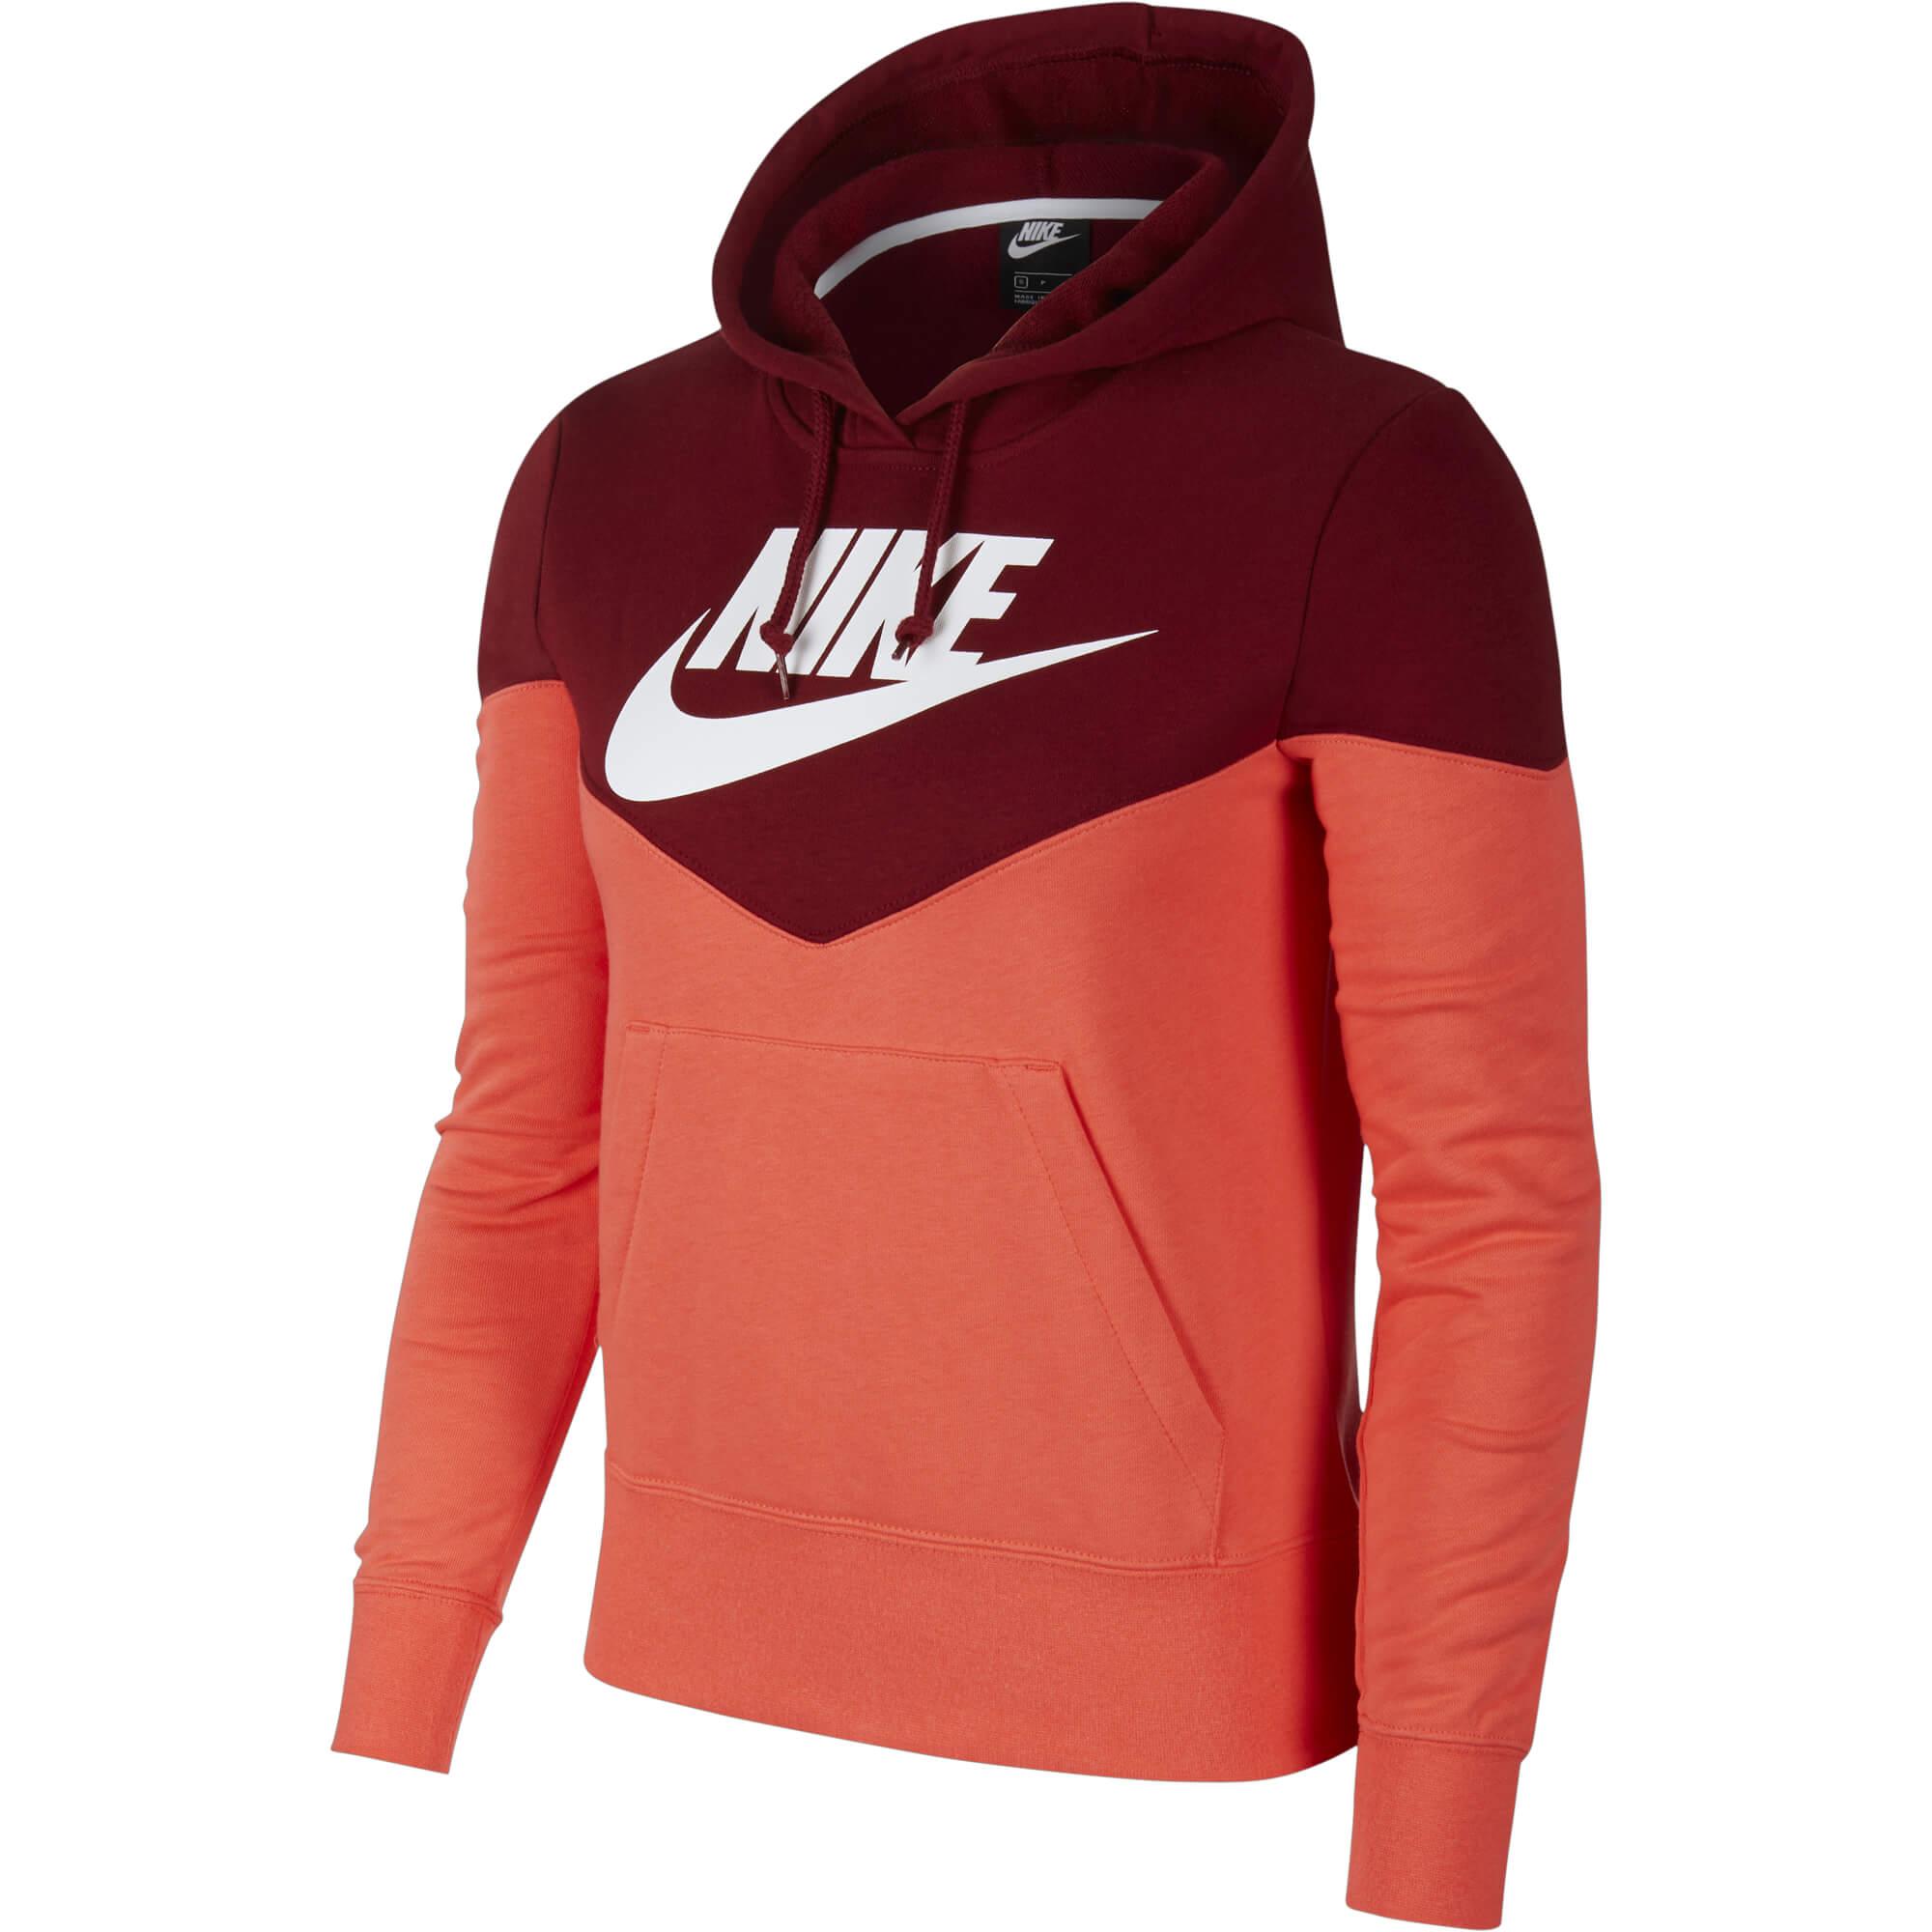 949beb74fb2b Nike ženski pulover HRTG HOODIE FLC Rdeča - Ceneje.si